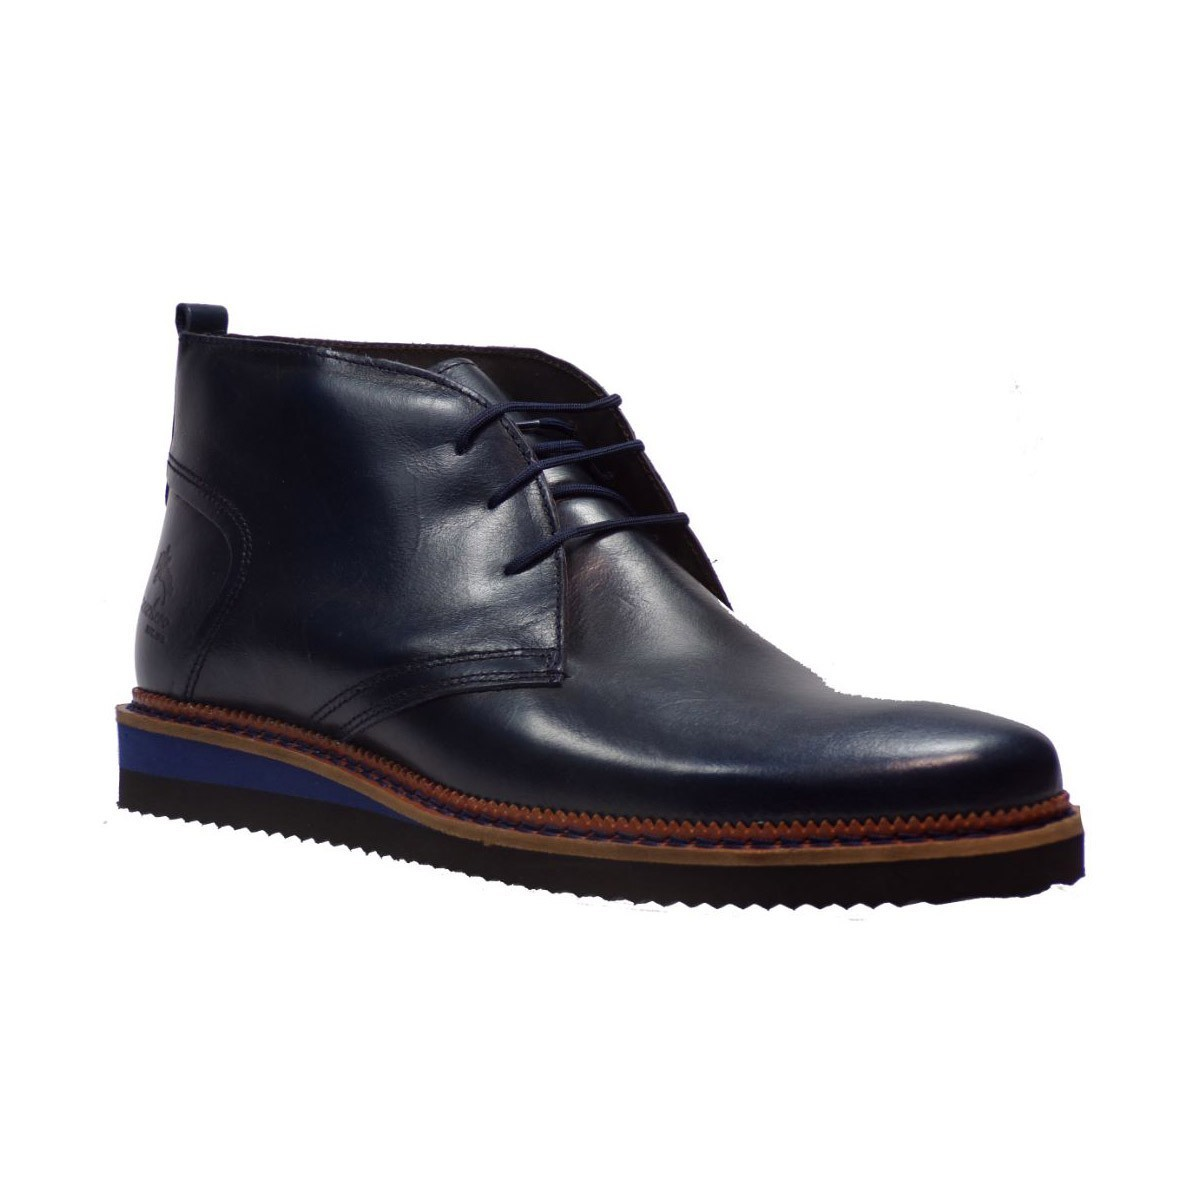 aabcb89c5d2 Commanchero Ανδρικά Παπούτσια Μποτάκια 71988 Μπλέ